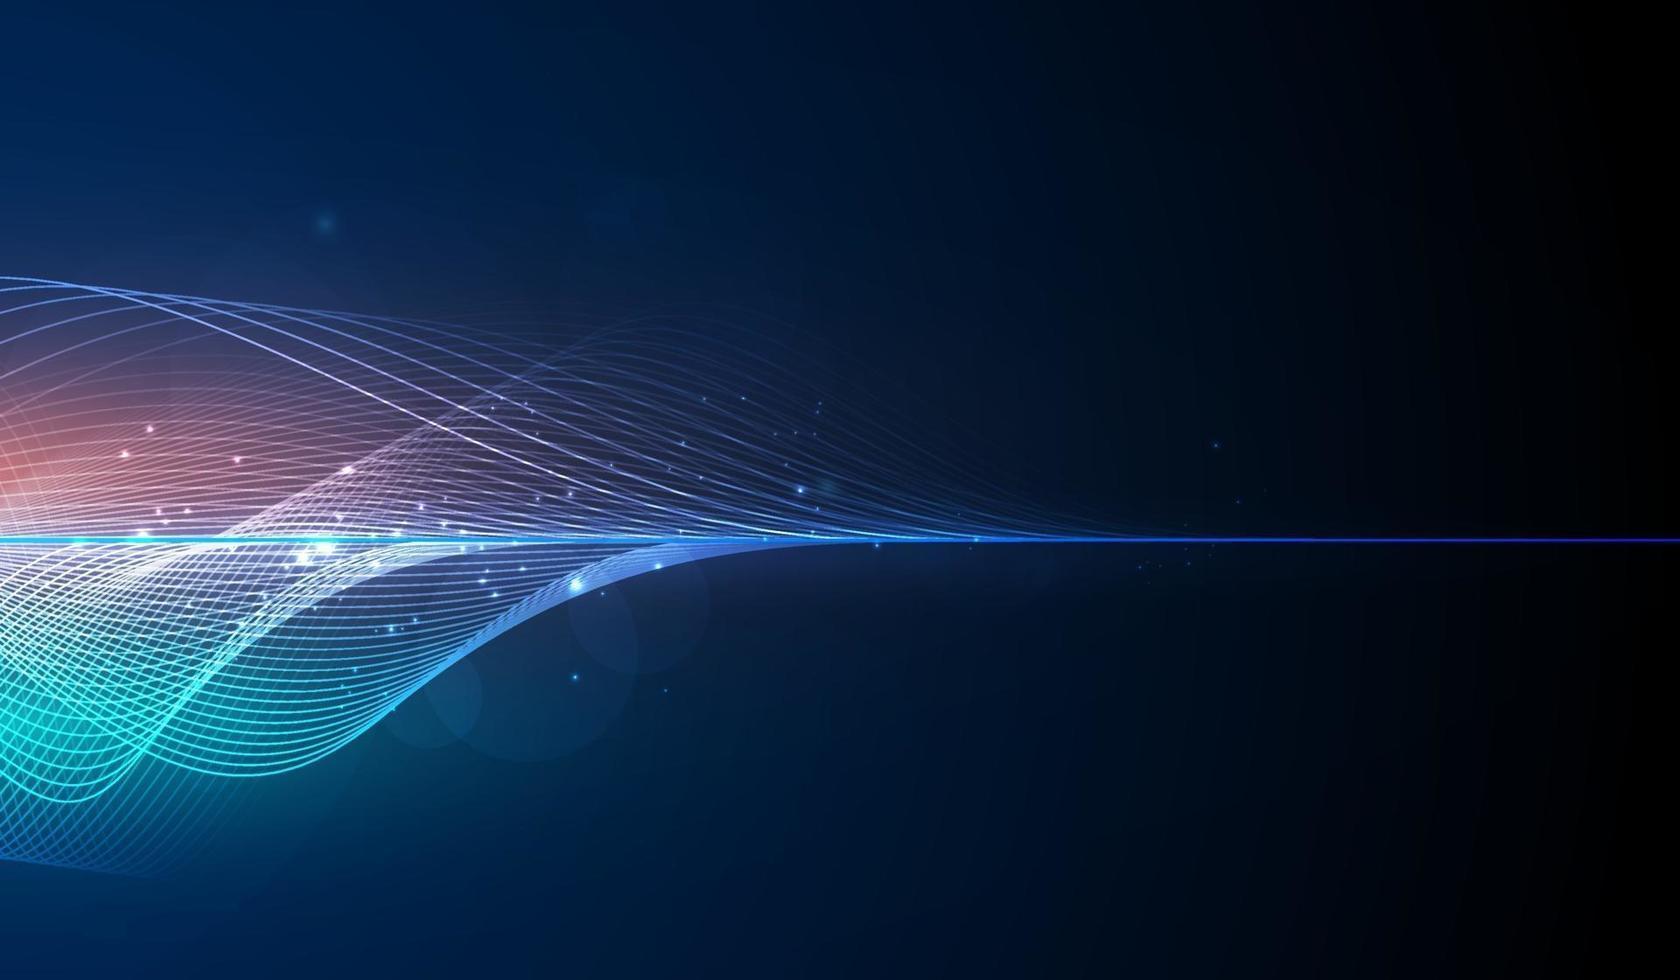 abstrakter blauer digitaler Entzerrer, Vektor des Schallwellenmusterelements